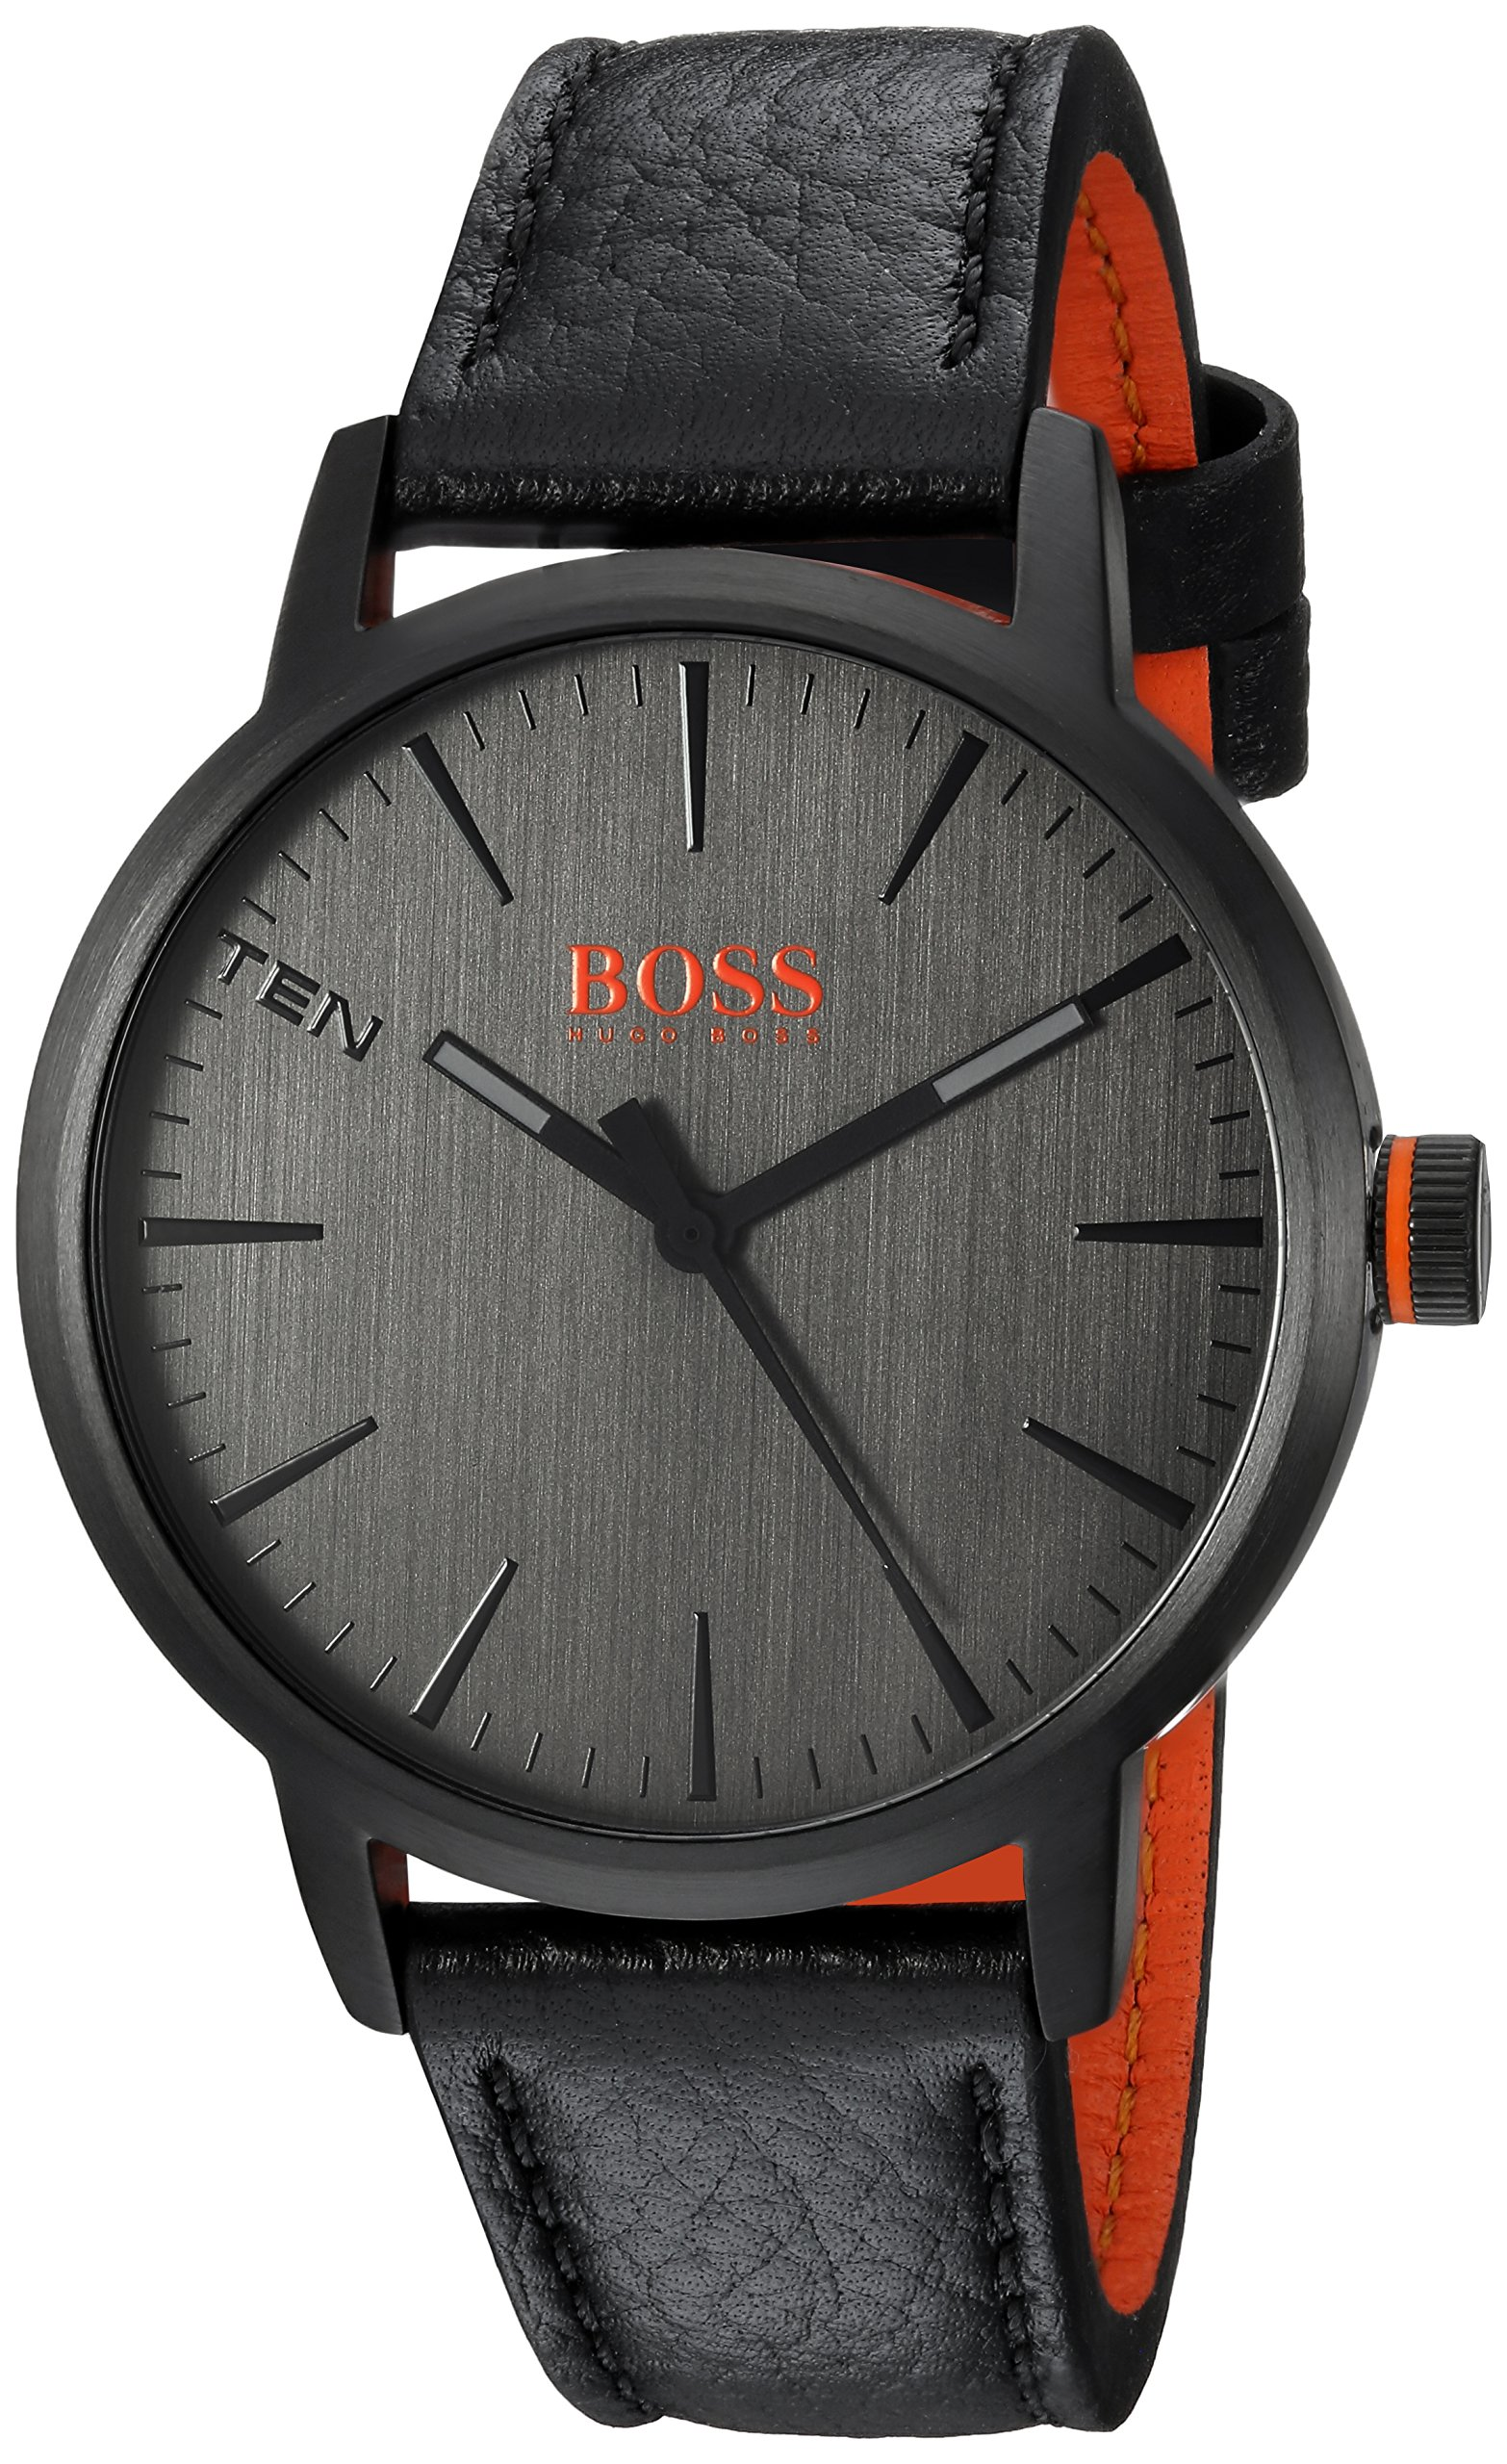 HUGO BOSS Men's Copenhagen Stainless Steel Quartz Watch with Leather Strap, Black, 20 (Model: 1550055)